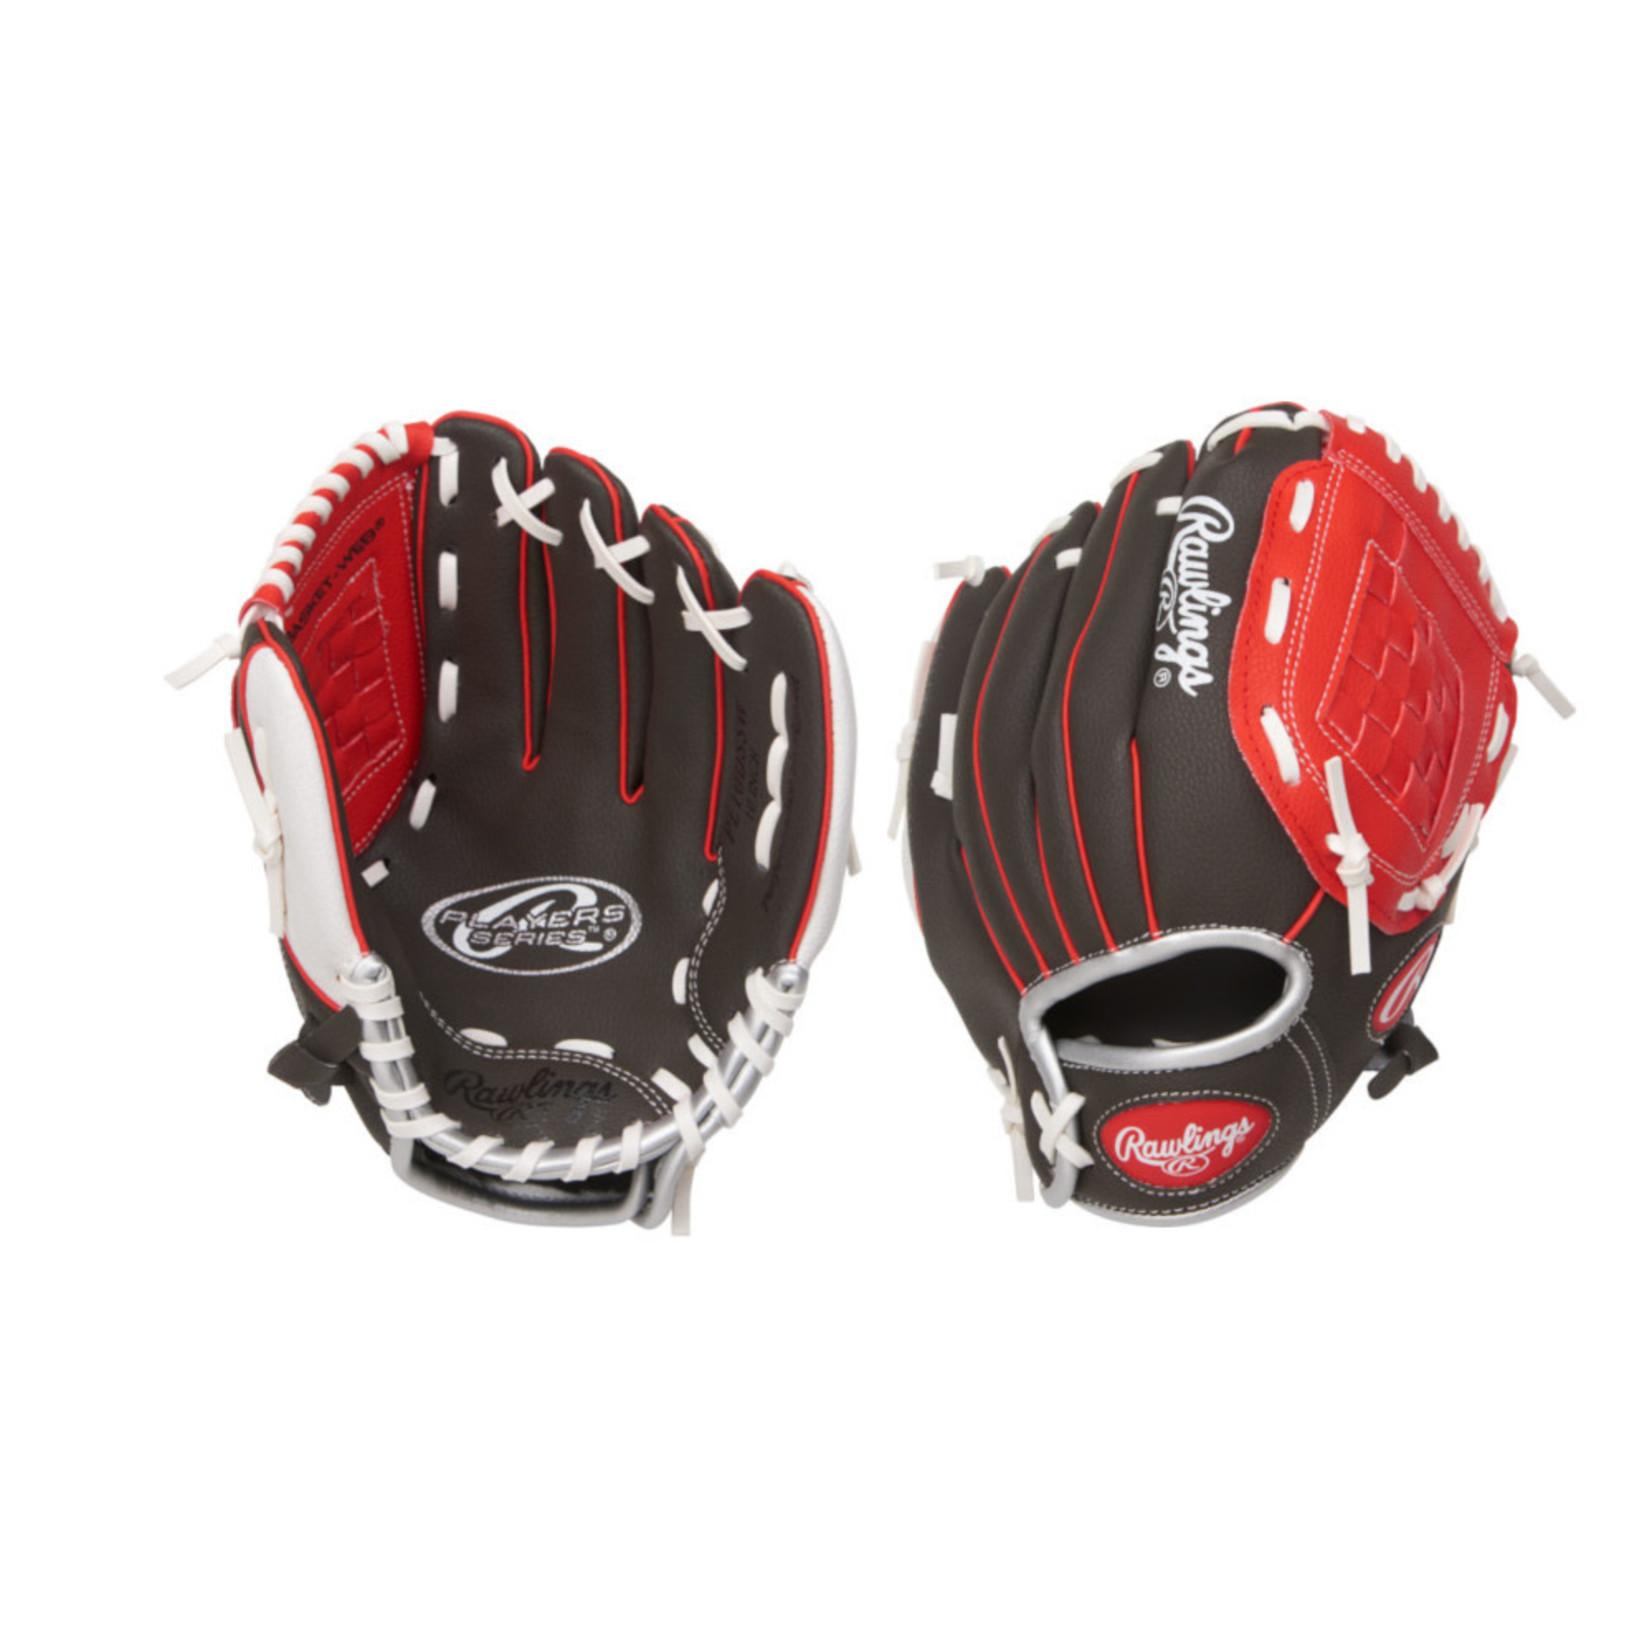 "Rawlings Rawlings Baseball Glove, Players Series, PL10DSSW, 10"", Reg, Youth"